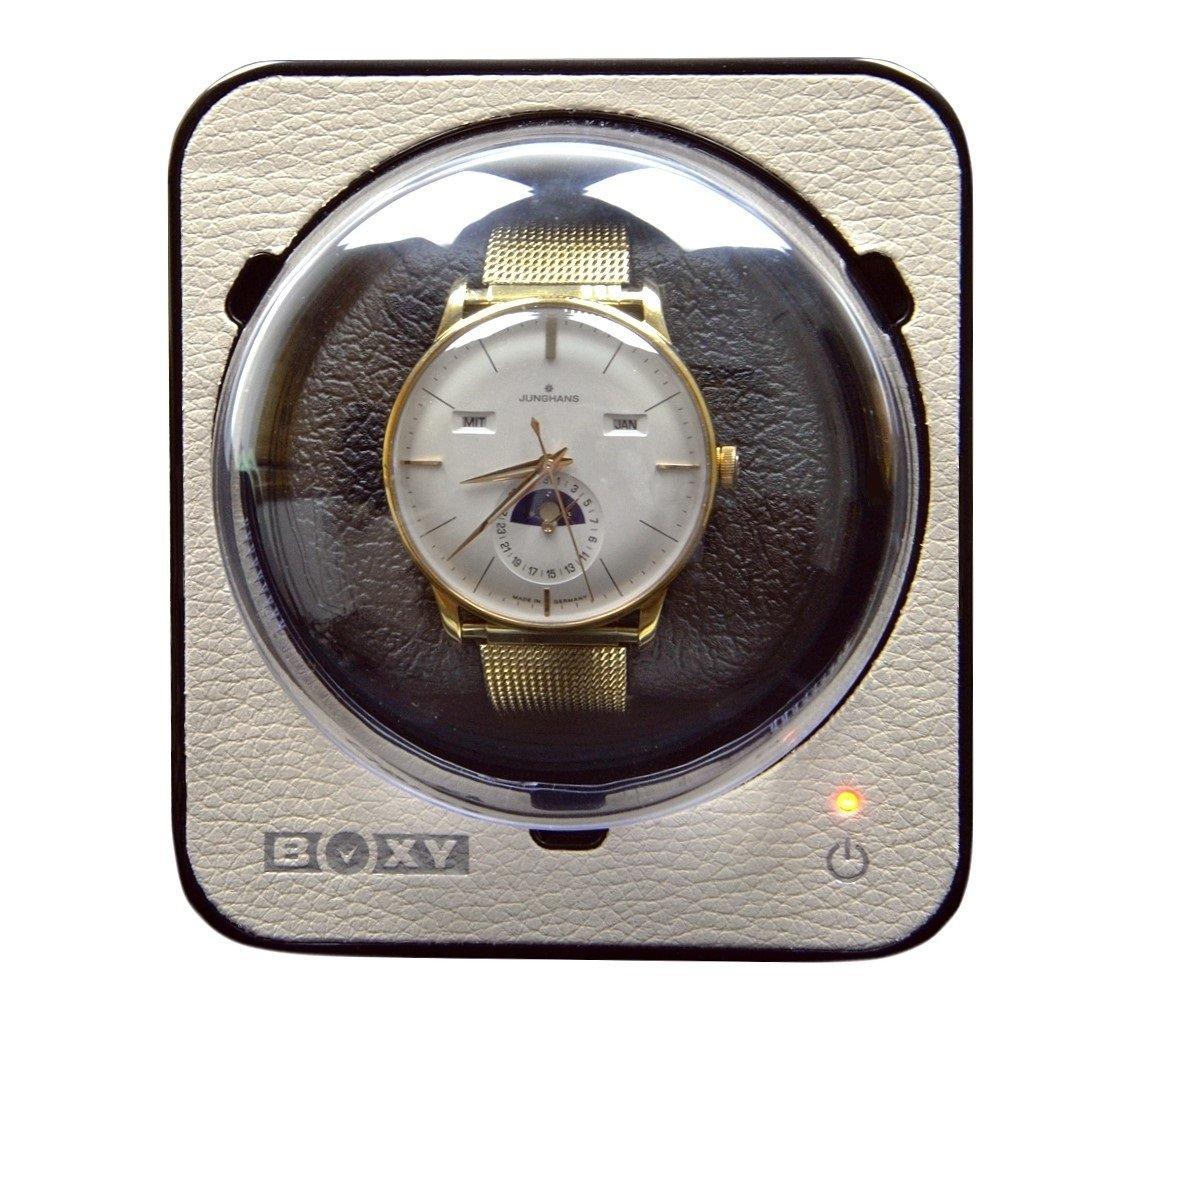 Scatola ricarica orologi Beco Technic BOXY FANCY PU-CUOIO crema